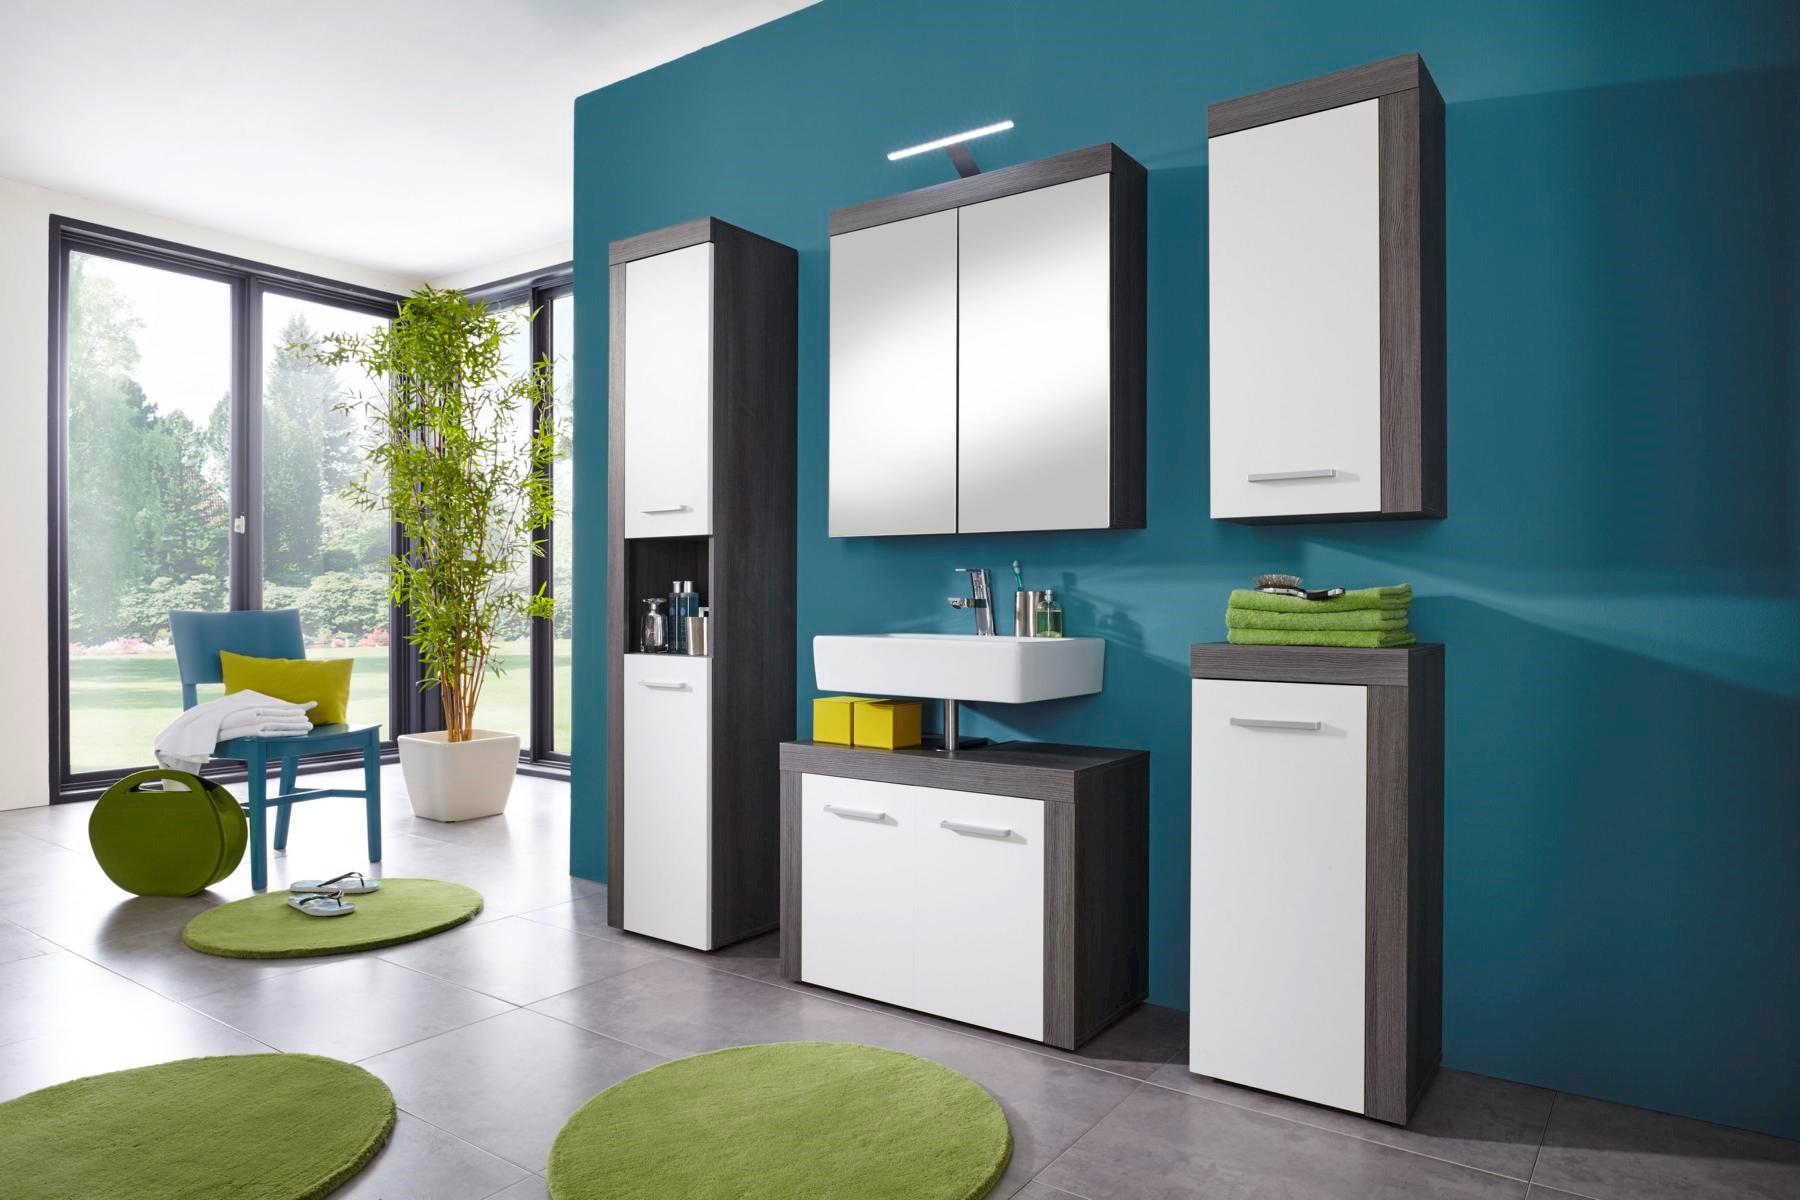 Badezimmer Kollektion Colombo 5-teilig in Weiß/Silber